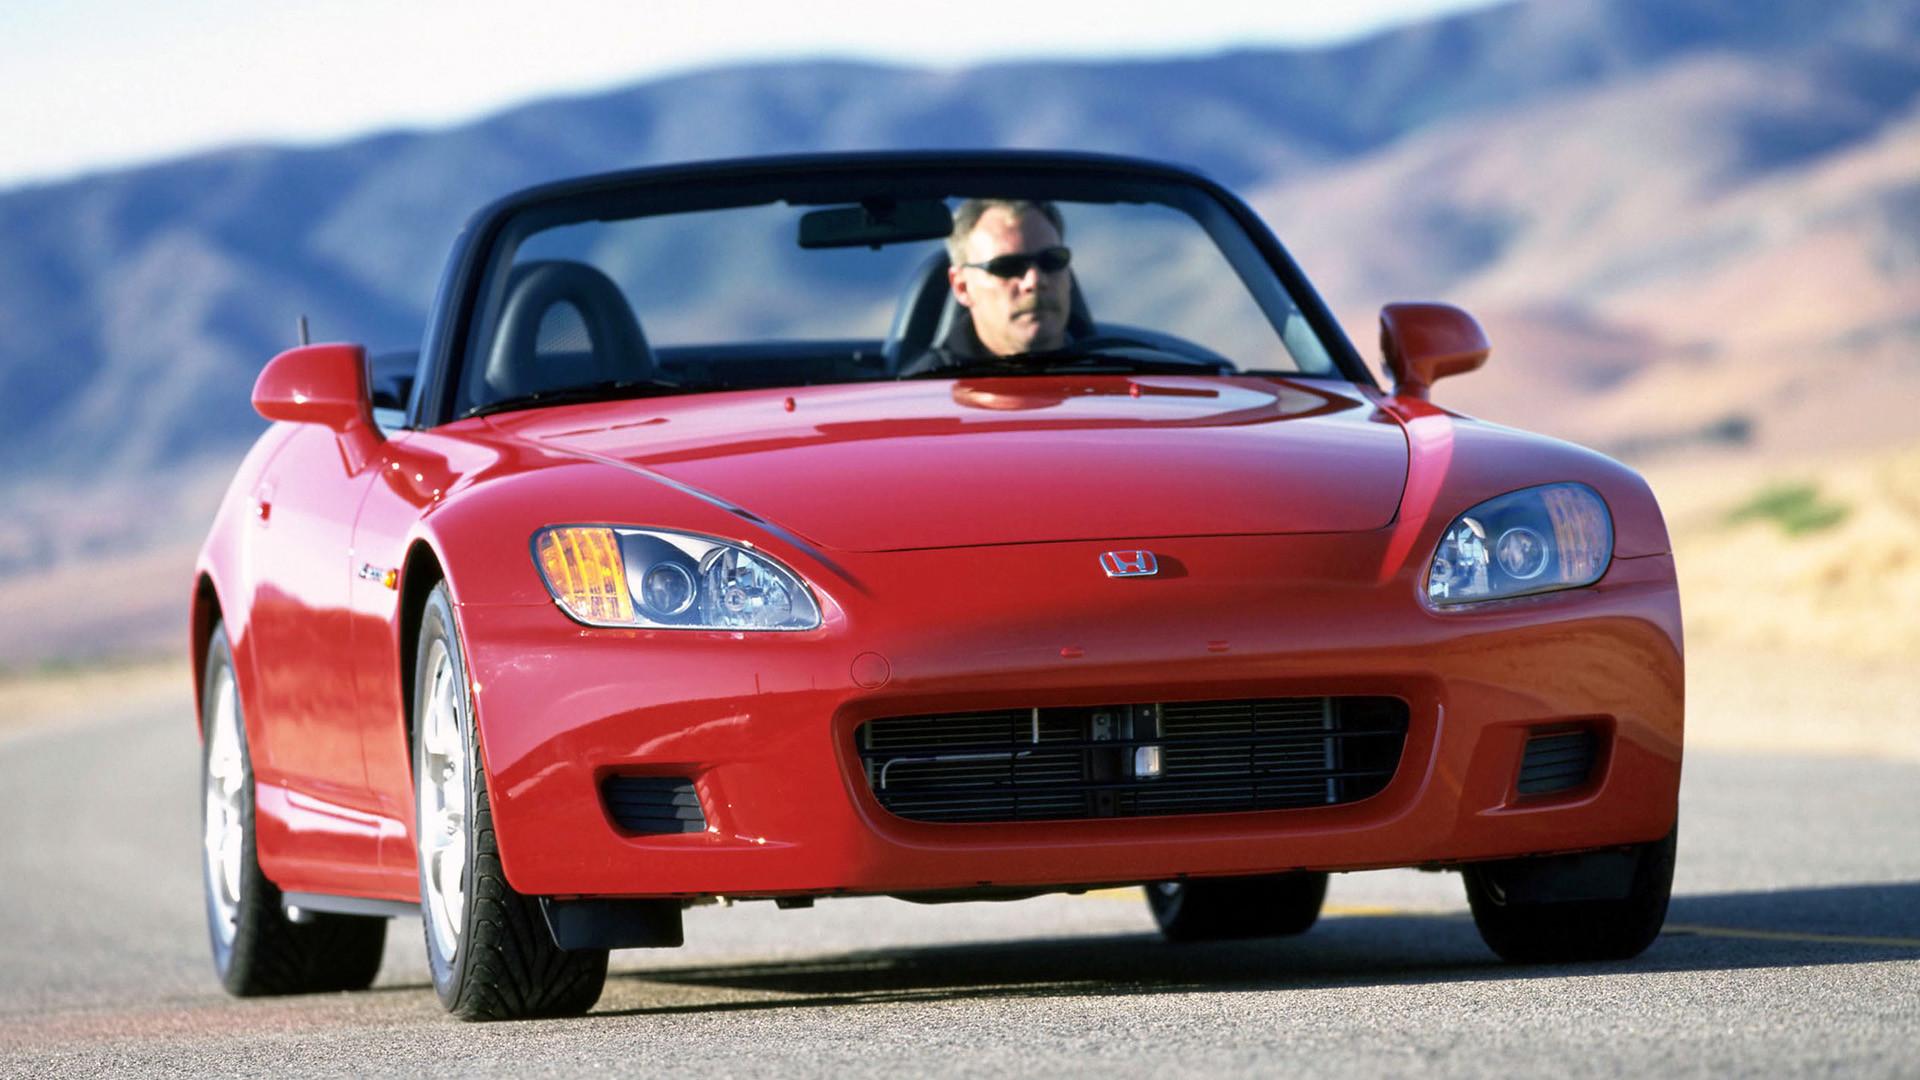 Res: 1920x1080, 1999 Honda S2000 picture.